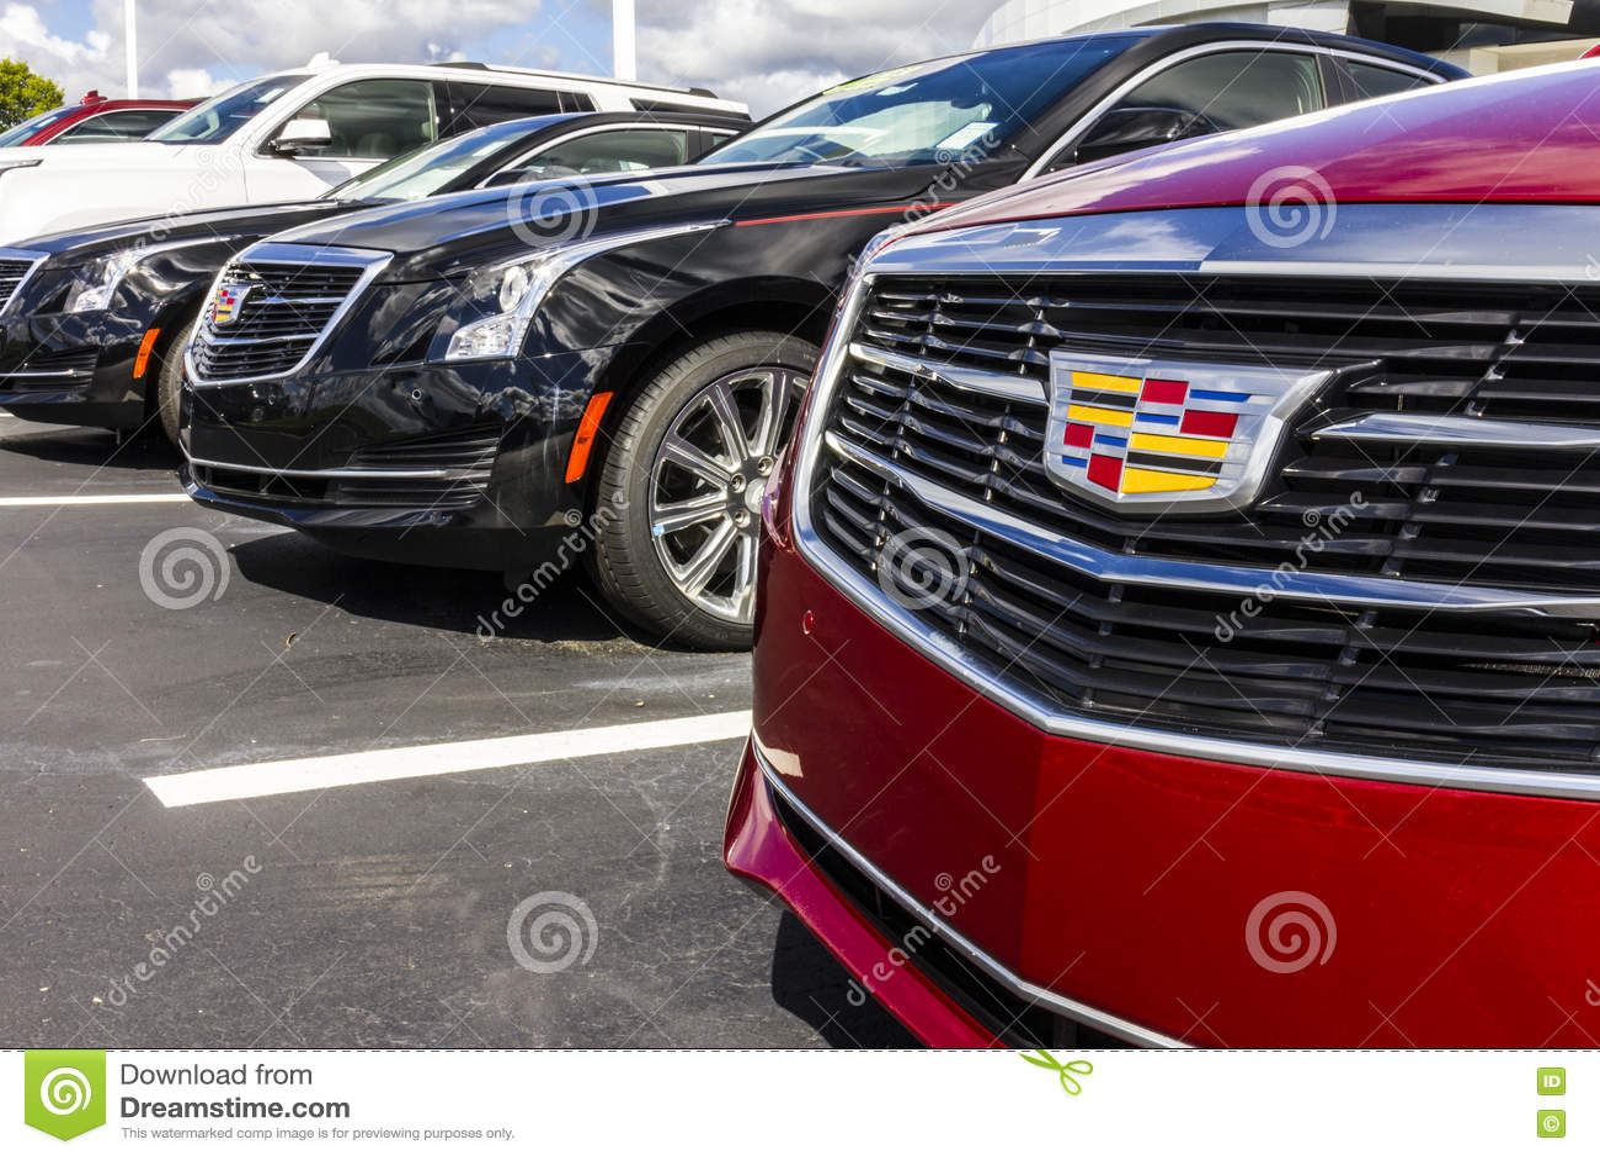 Indianapolis Circa September 2016 Cadillac Automobile Dealership